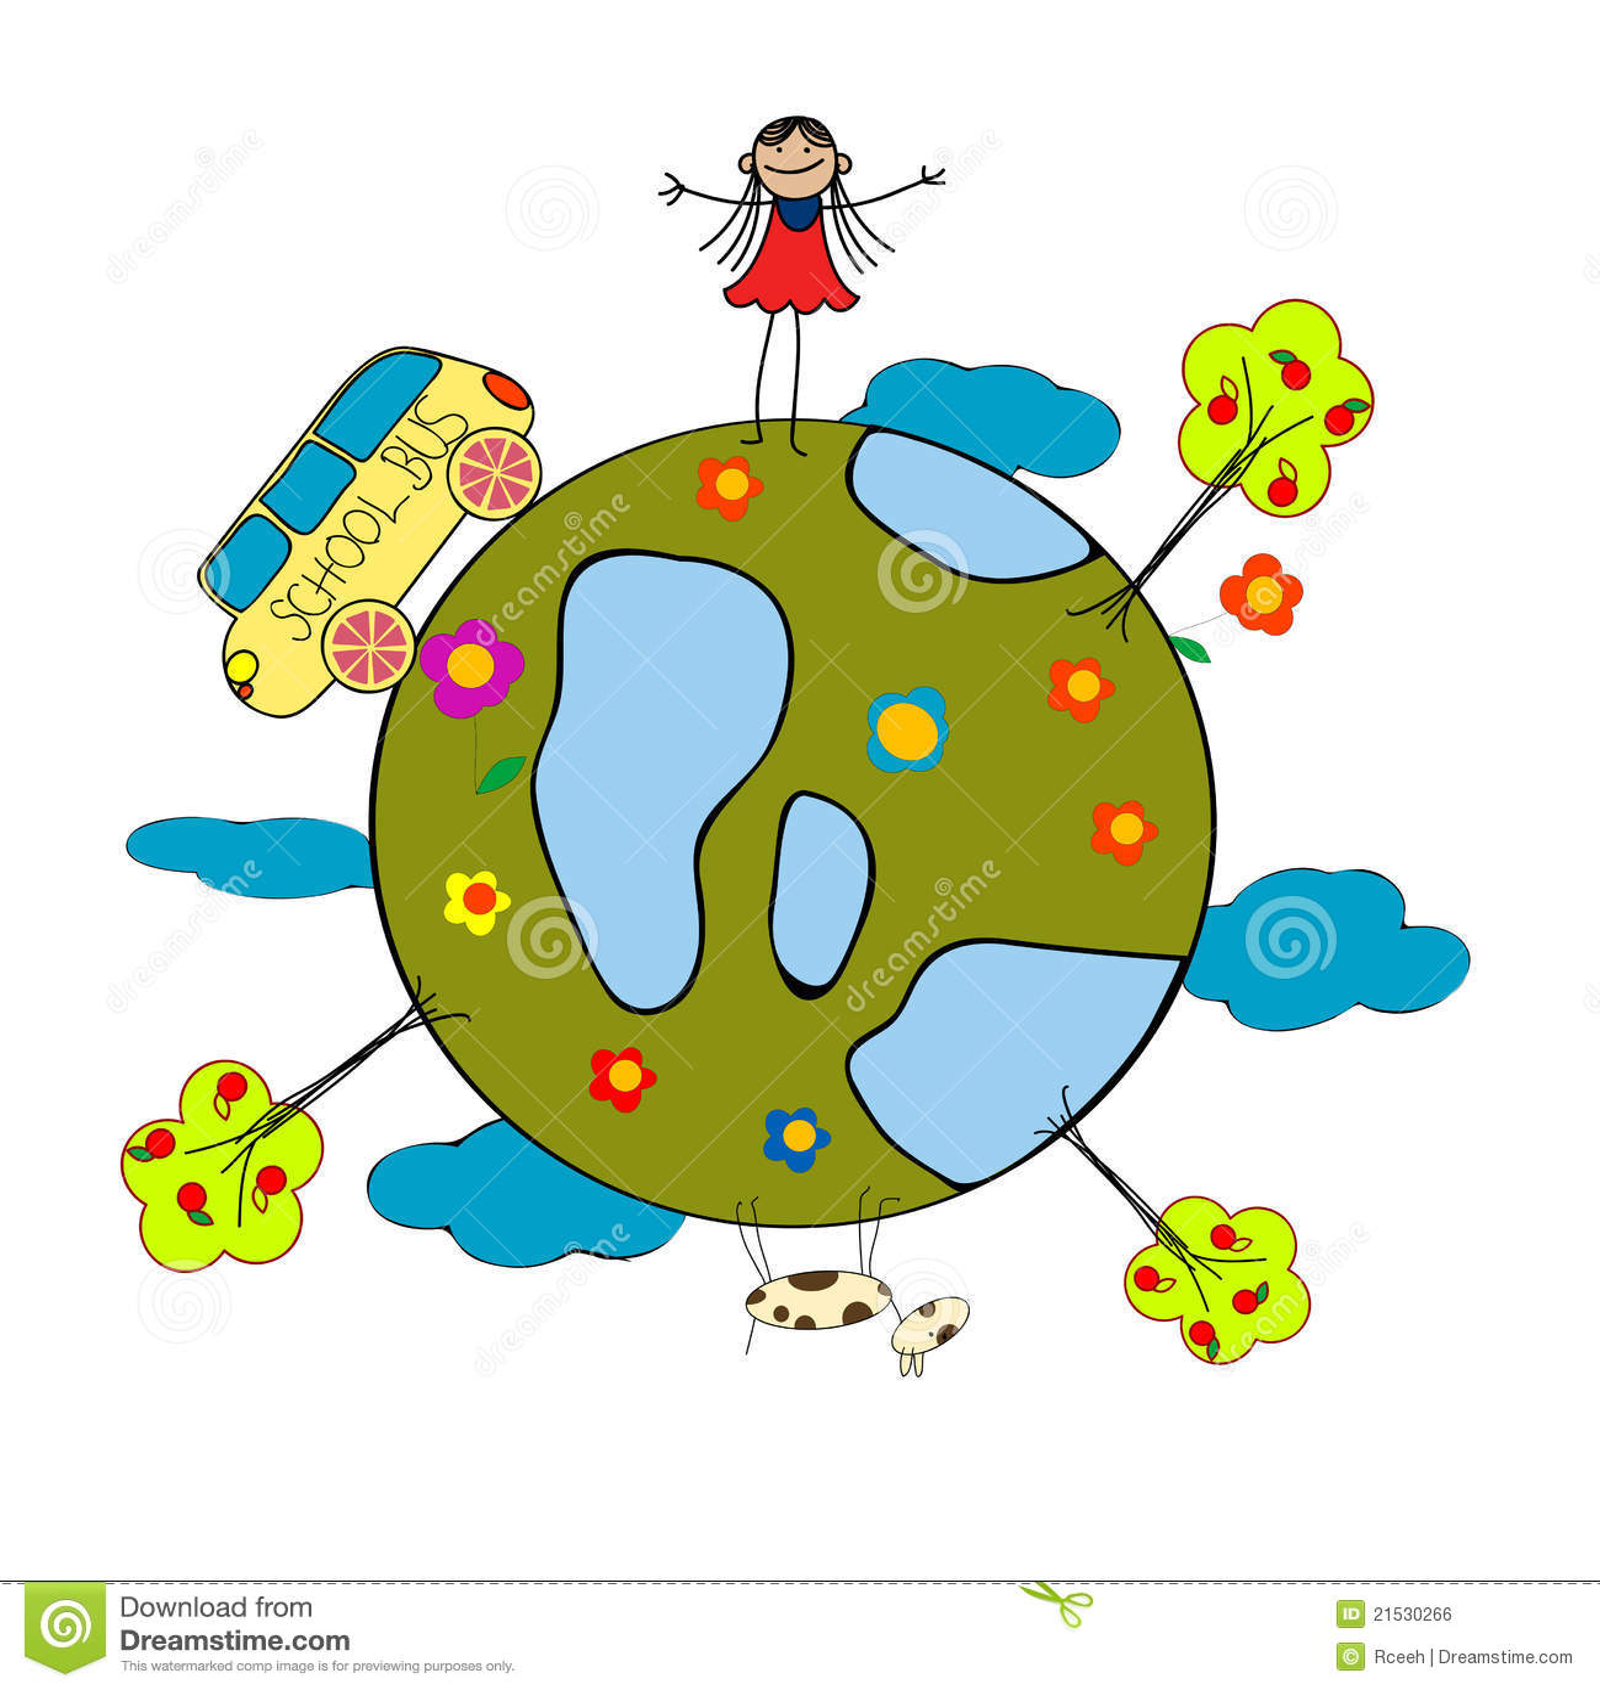 childlike drawing royalty free stock image image 21530266